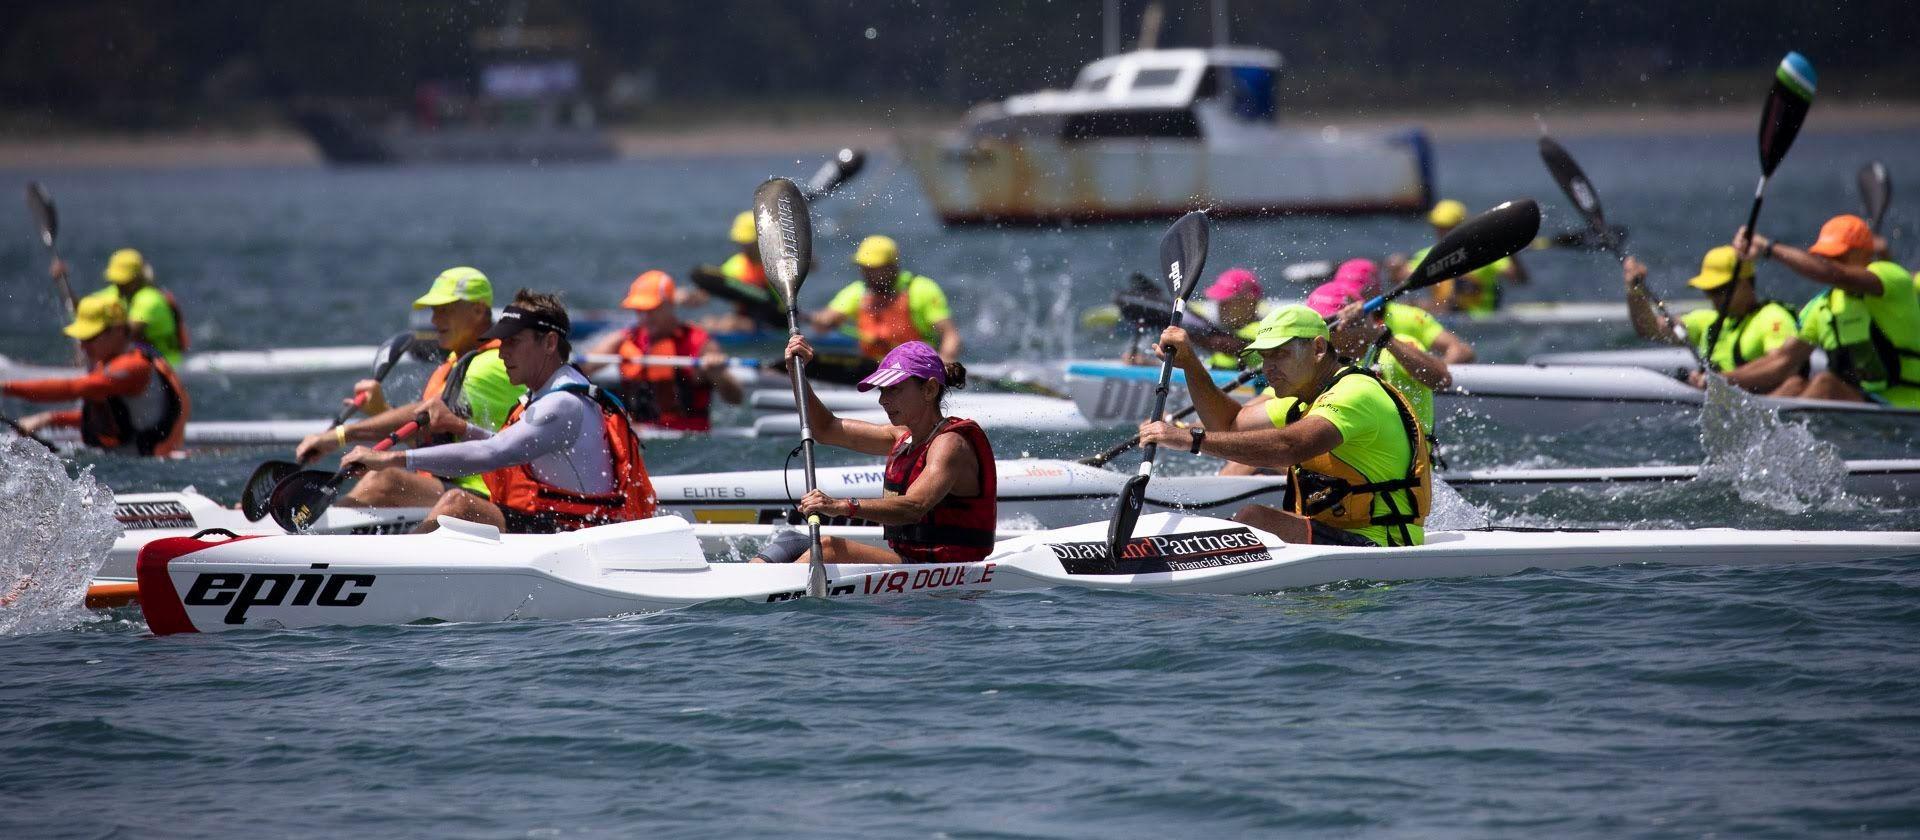 Mandurah will also host the 2023 Paddle Australia Canoe Ocean Racing Championships ©Paddle Australia/Allan Coker